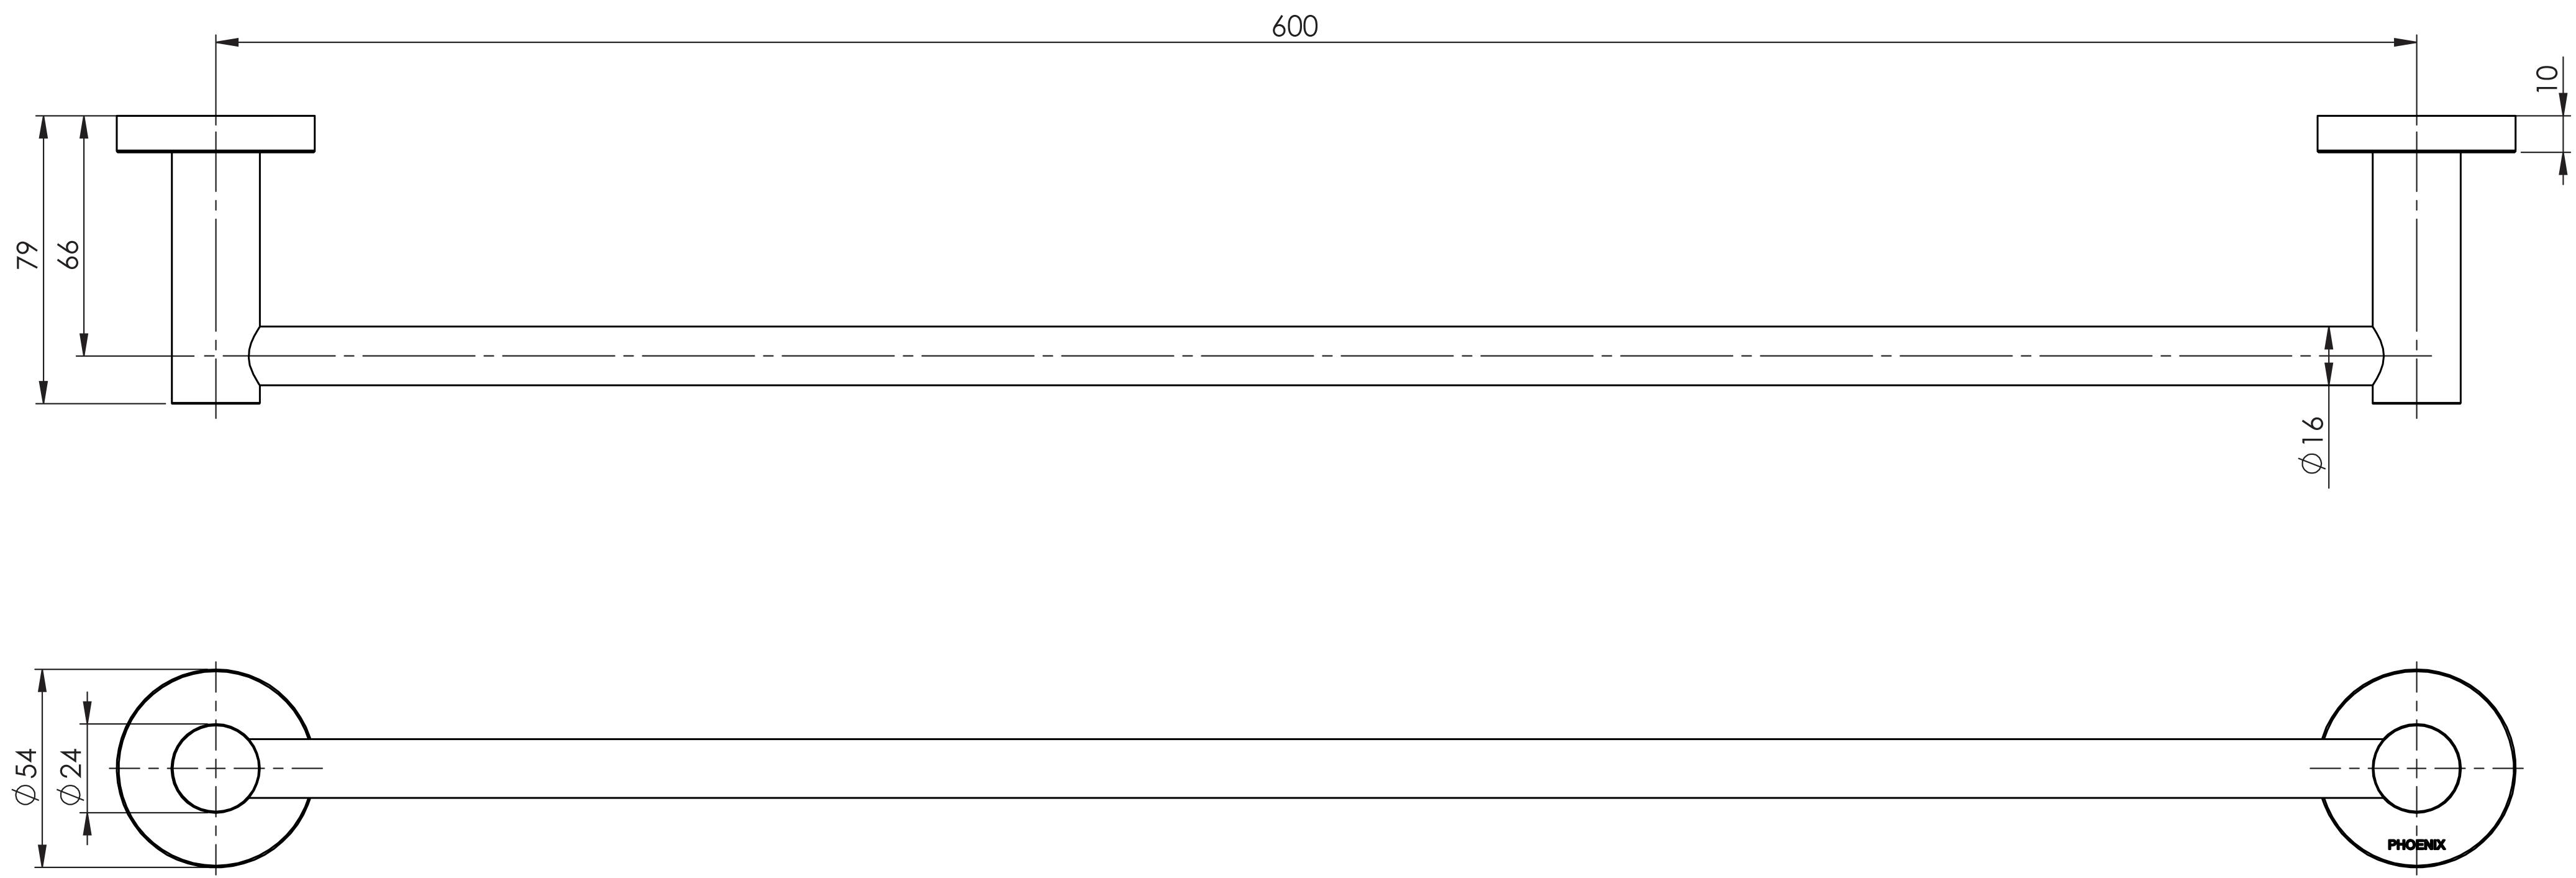 Radii Single 600 Rail specs